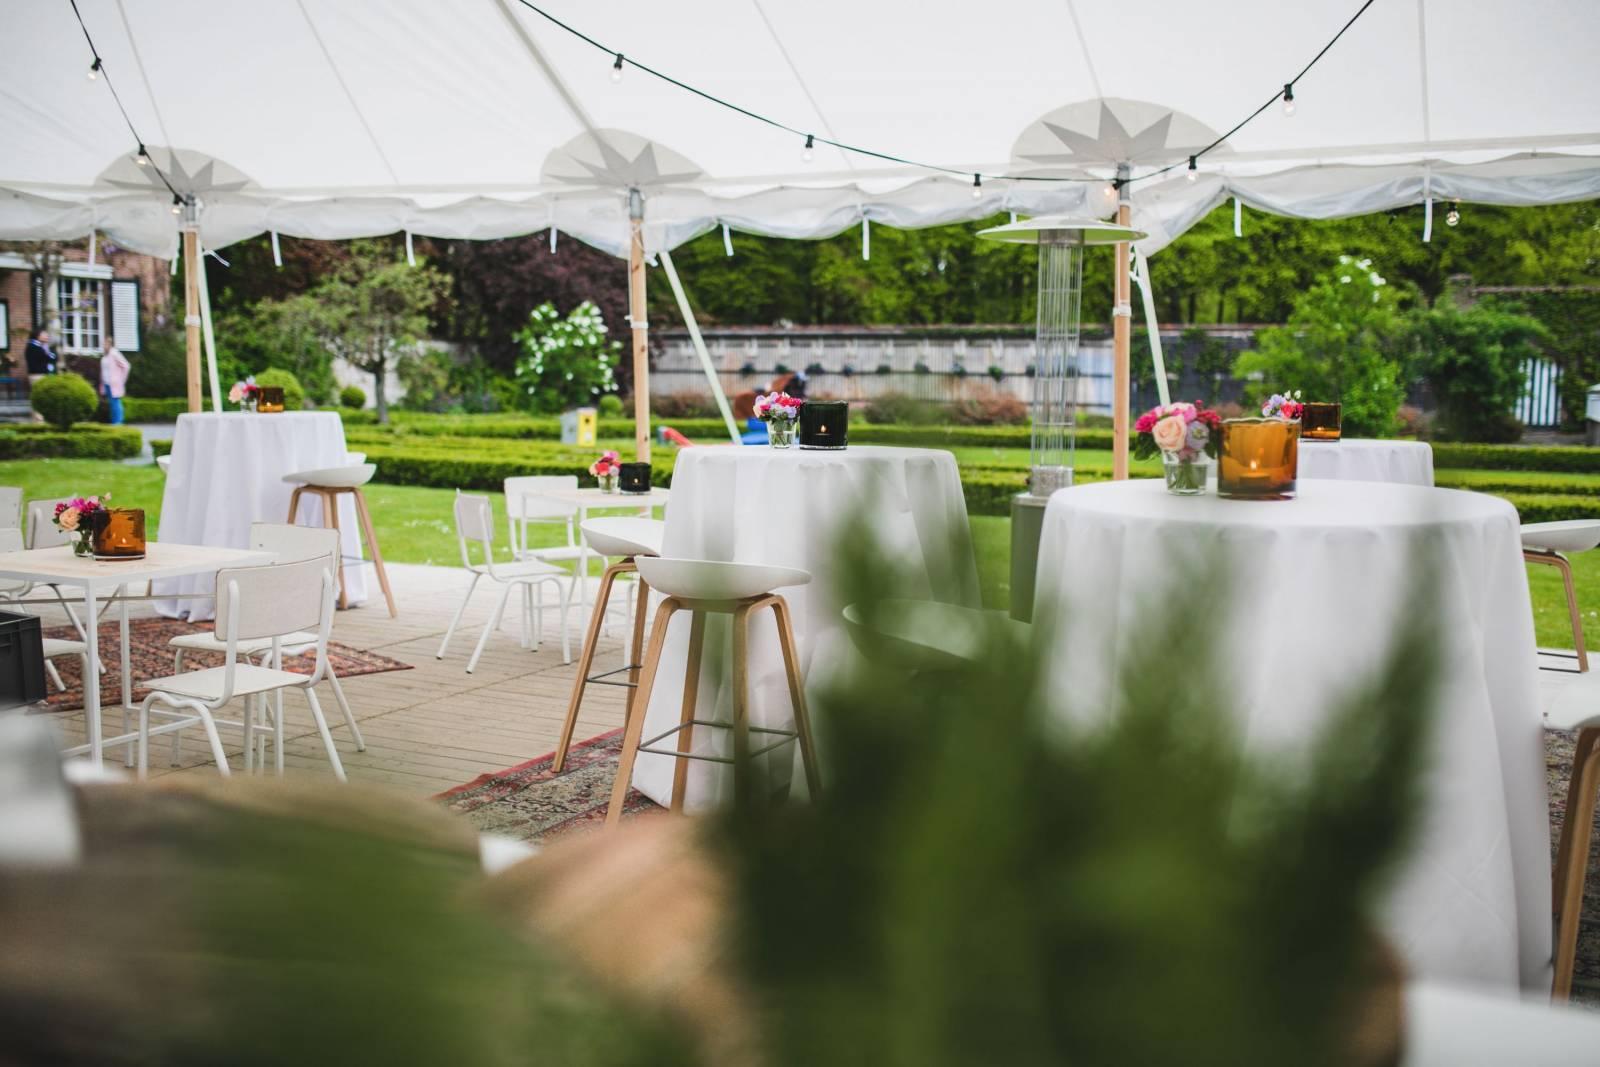 Wolvenbos - House of Weddings  - 3